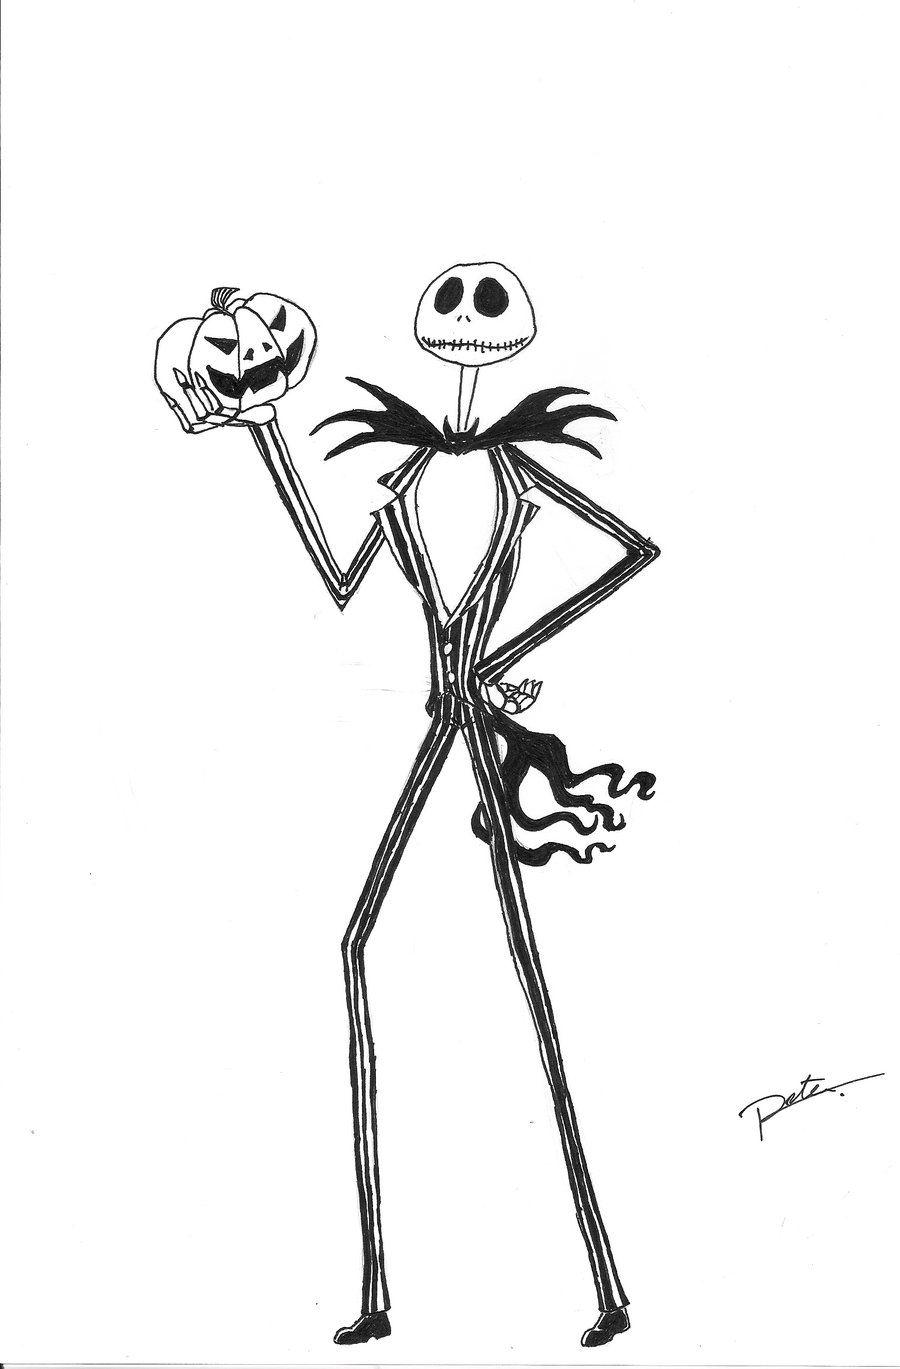 Jack Skellington Holding A Pumpkin By Kyrens64 On Deviantart